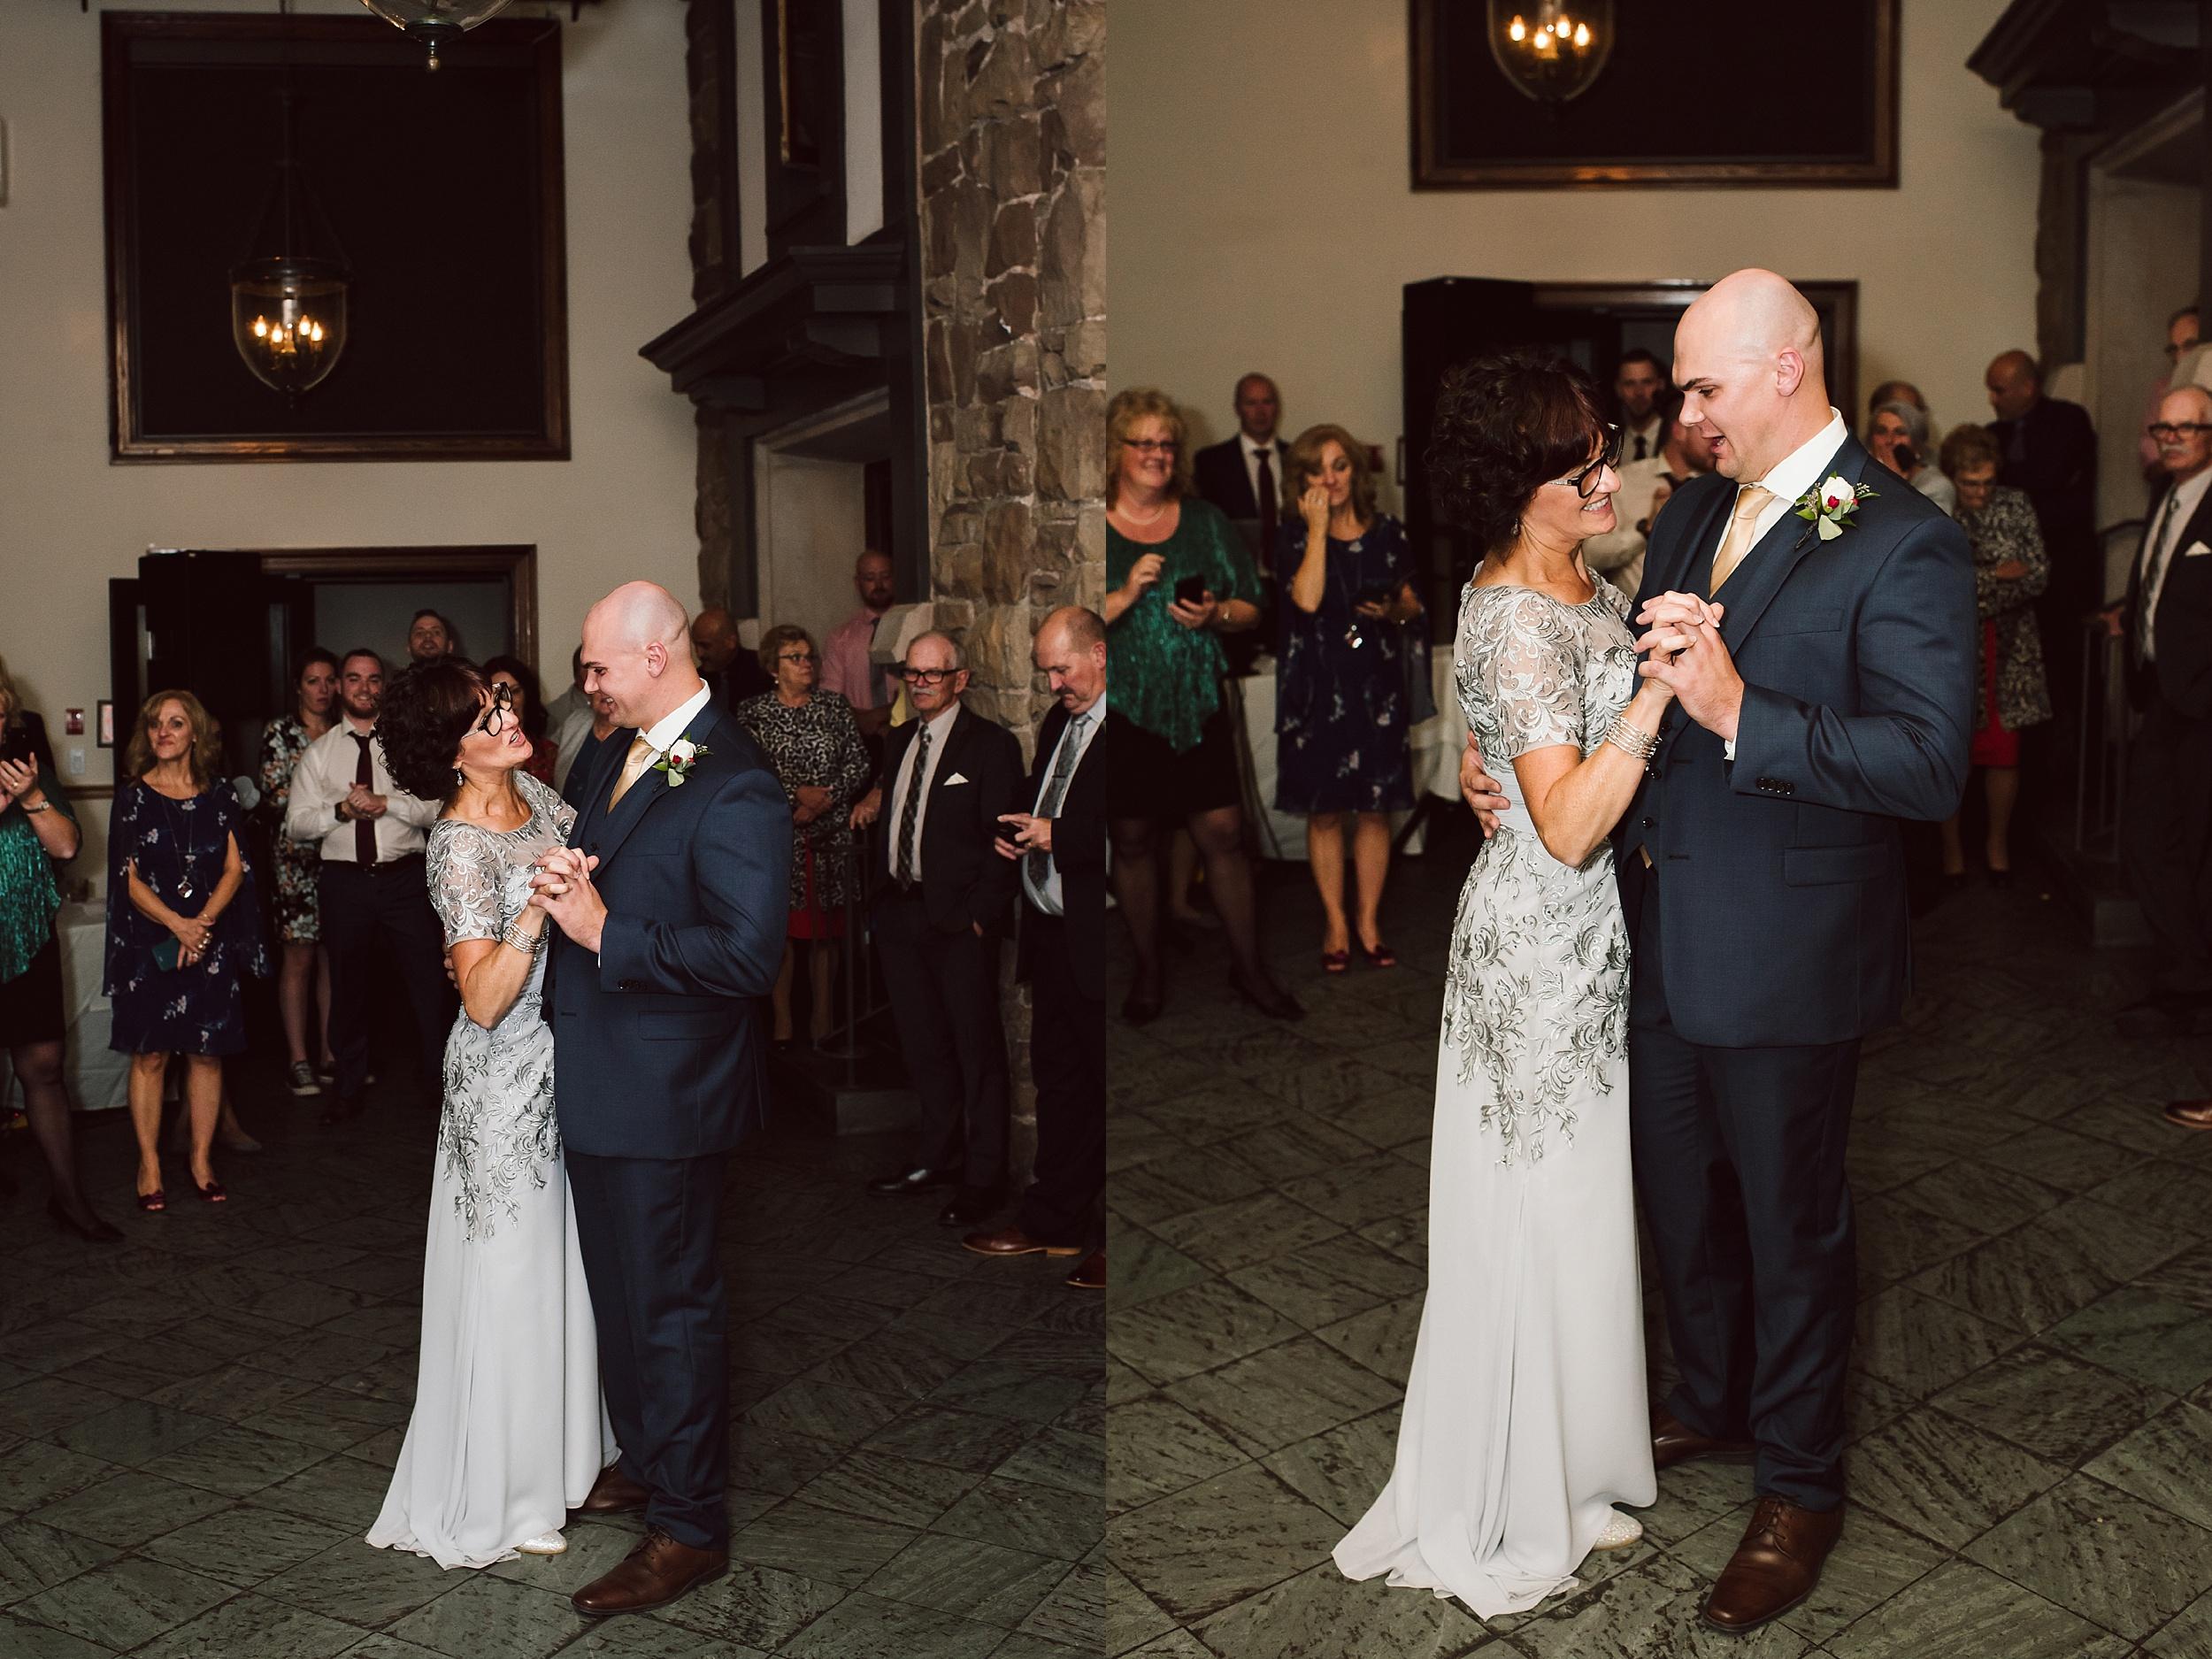 Windemere_Manor_Fall_Wedding_London_Toronto_Wedding_Photographer_0060.jpg